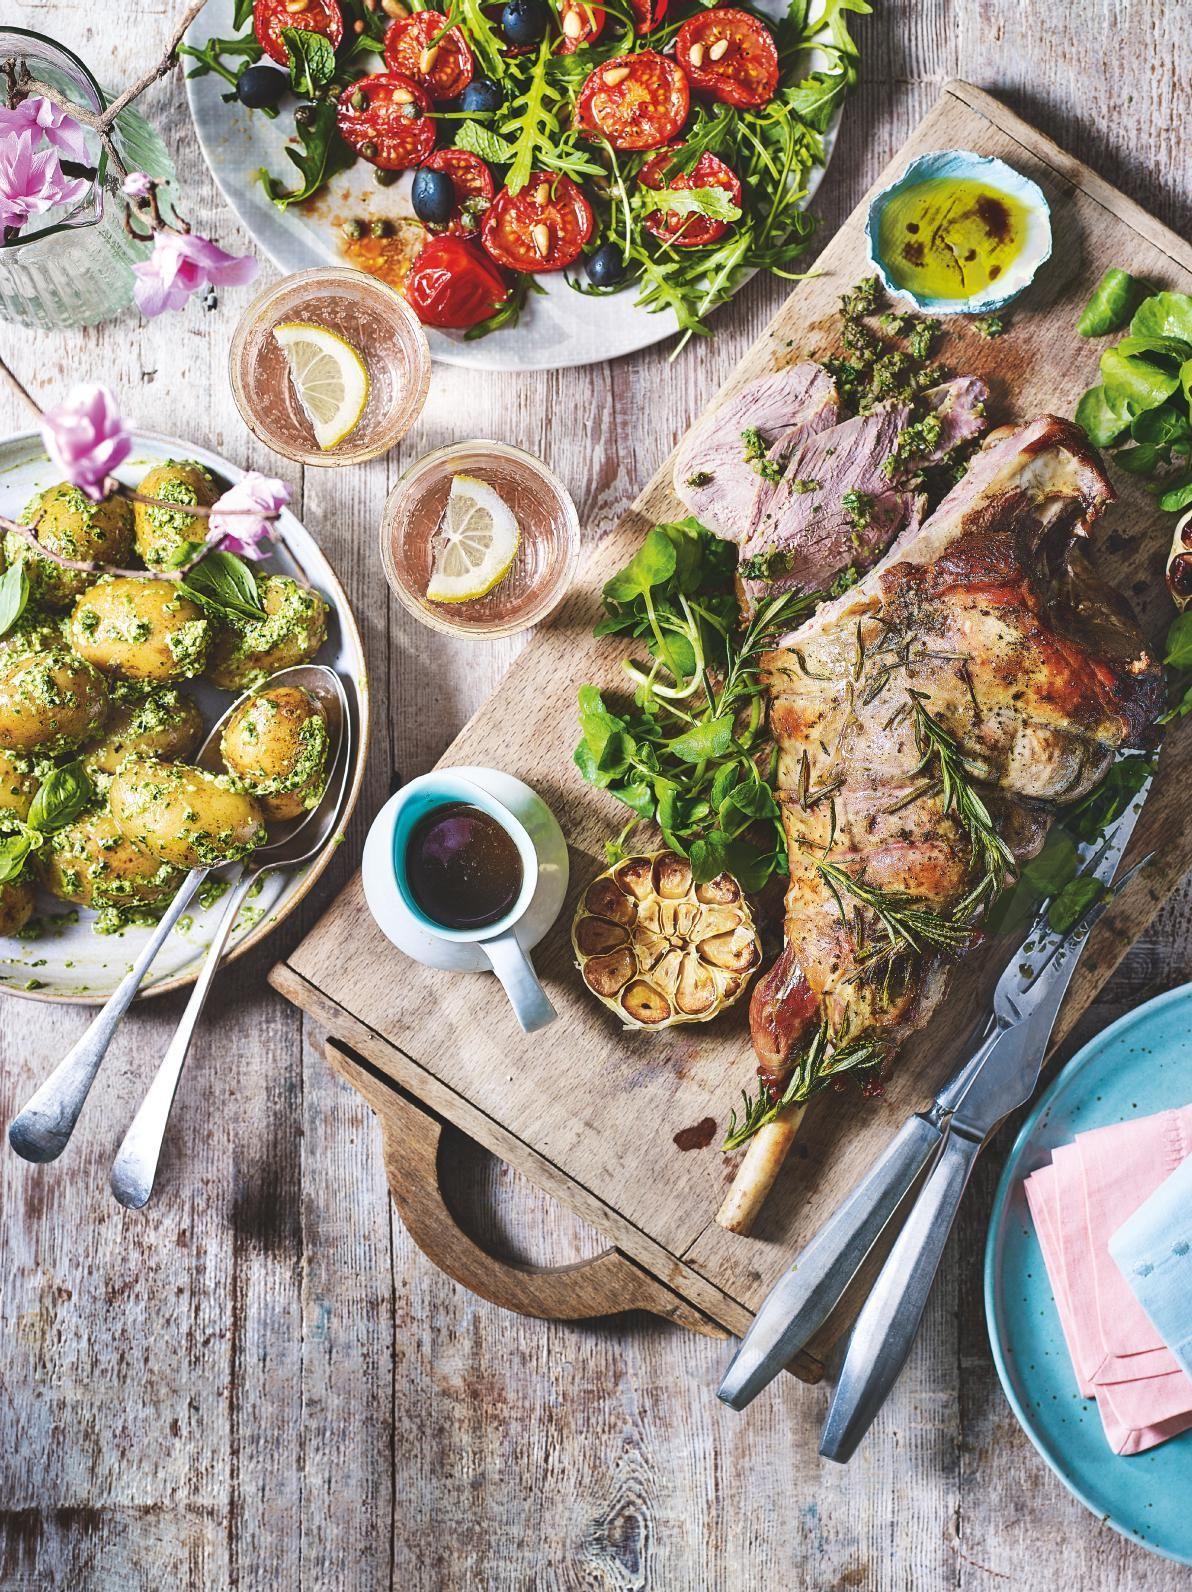 Tesco Magazine March 2018 Food Flatlay Spring Recipes